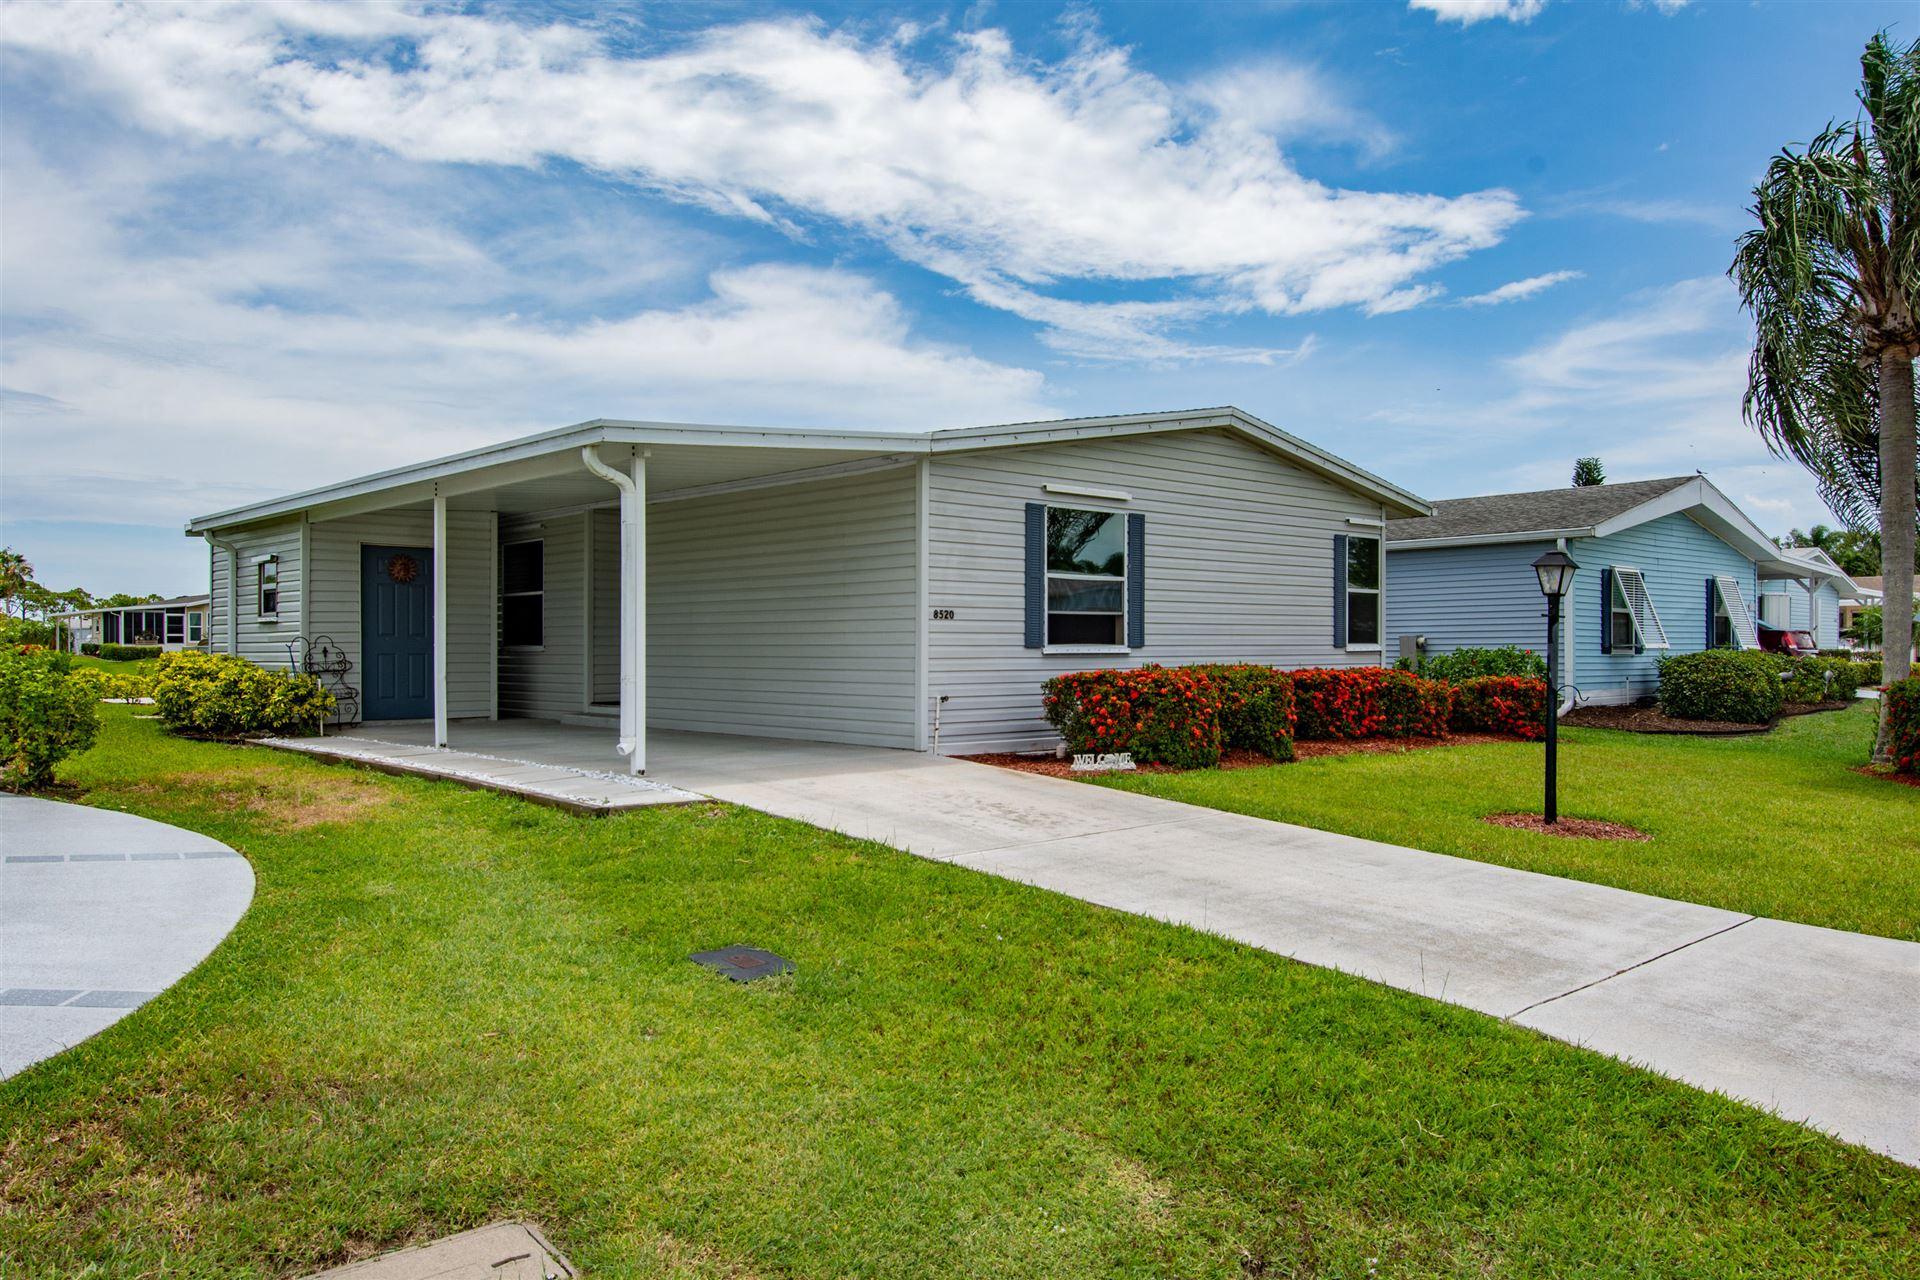 8520 Marlberry Court, Fort Pierce, FL 34952 - MLS#: RX-10721908